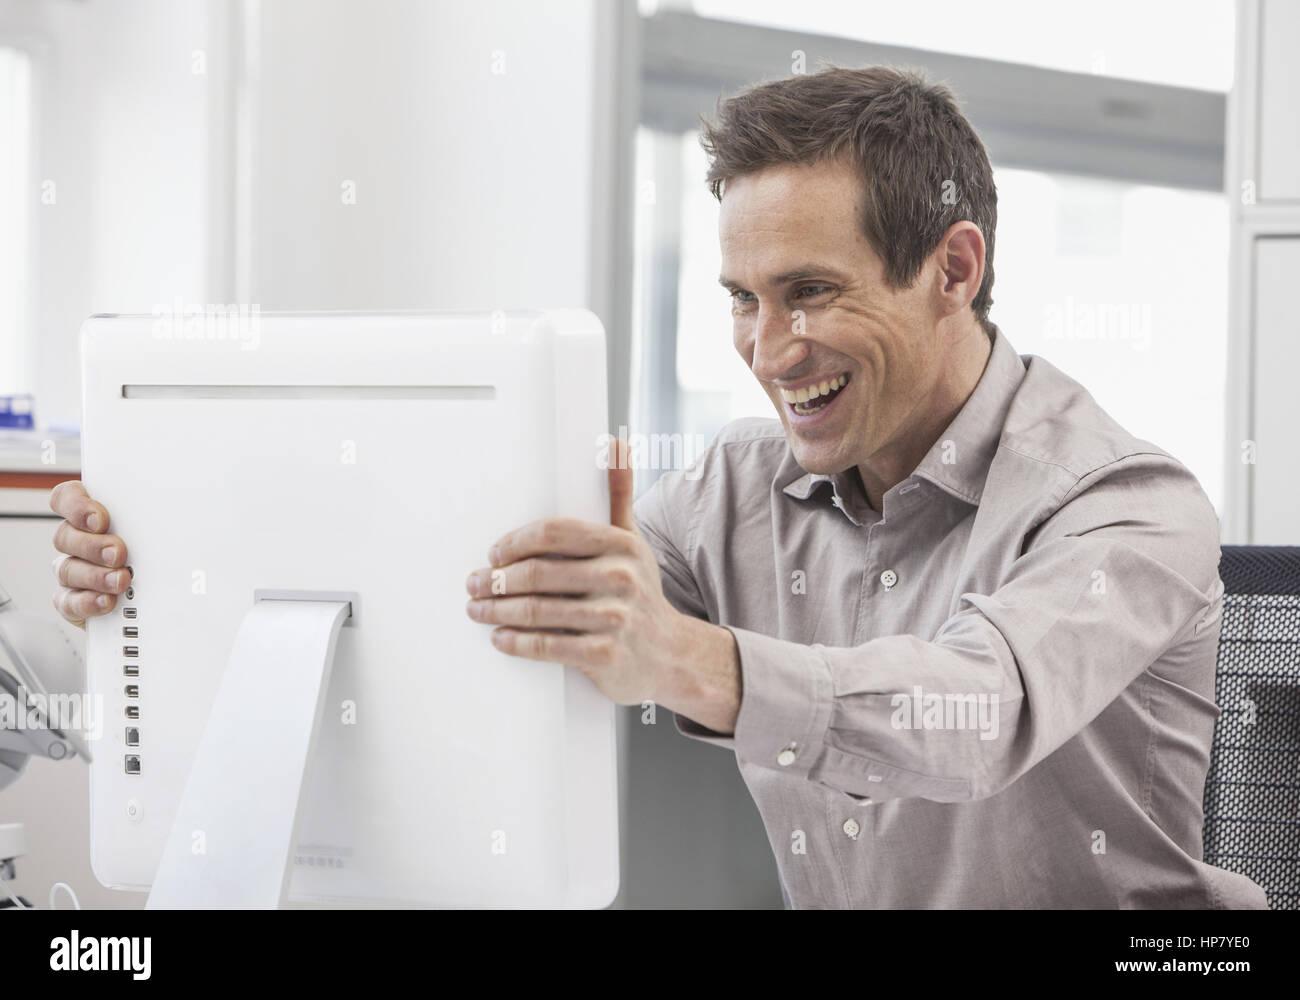 Mann packt erfreut seinen Bildschirm (model-released) - Stock Image